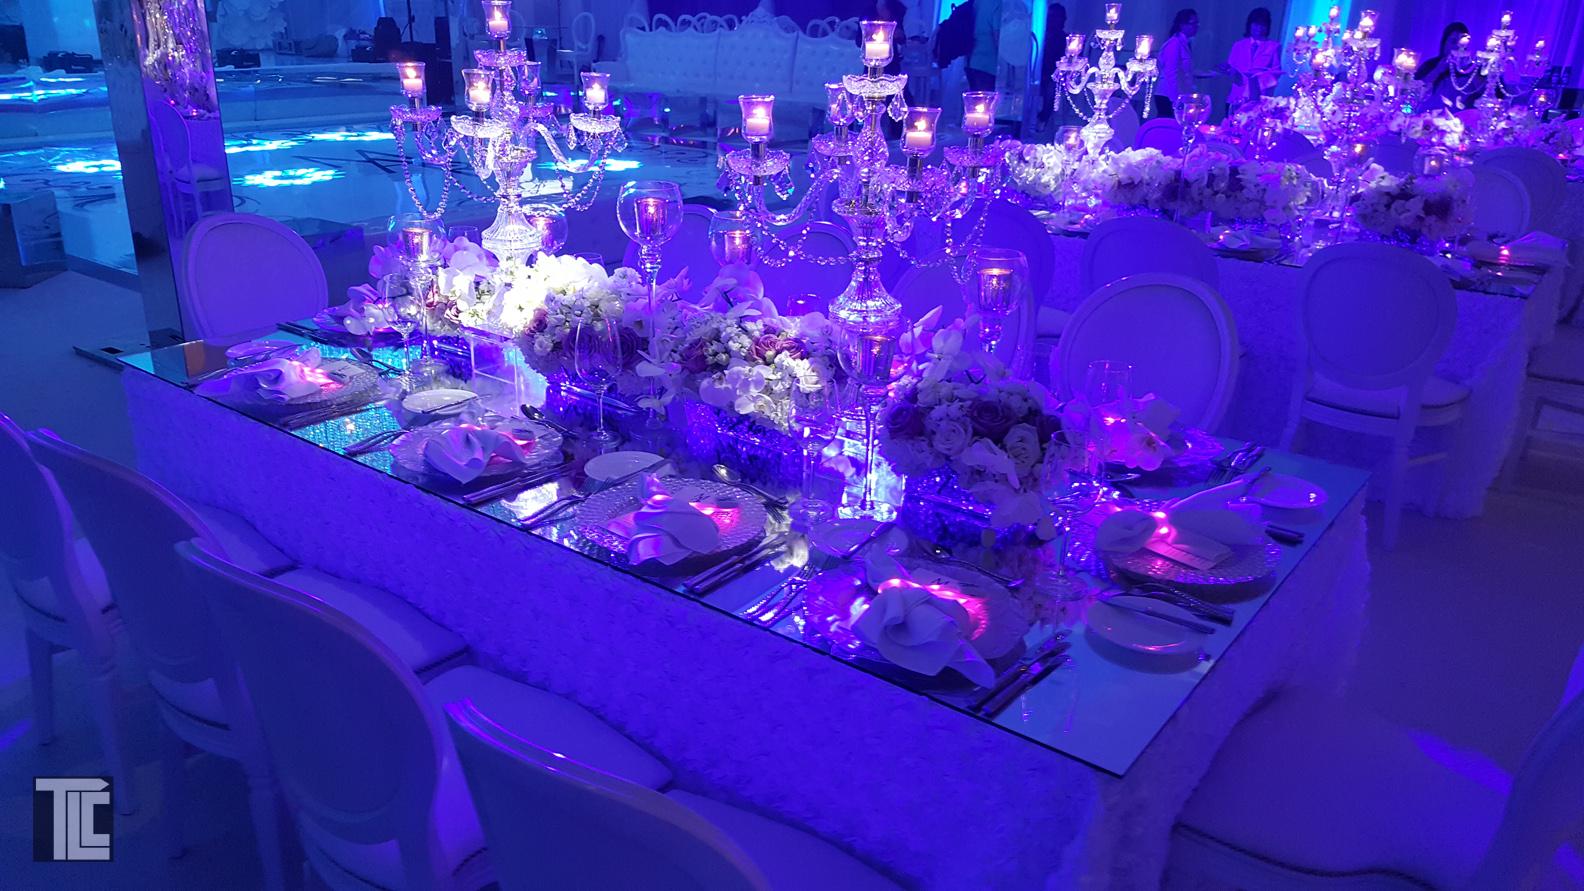 XylobandsUSA LED dinner decor